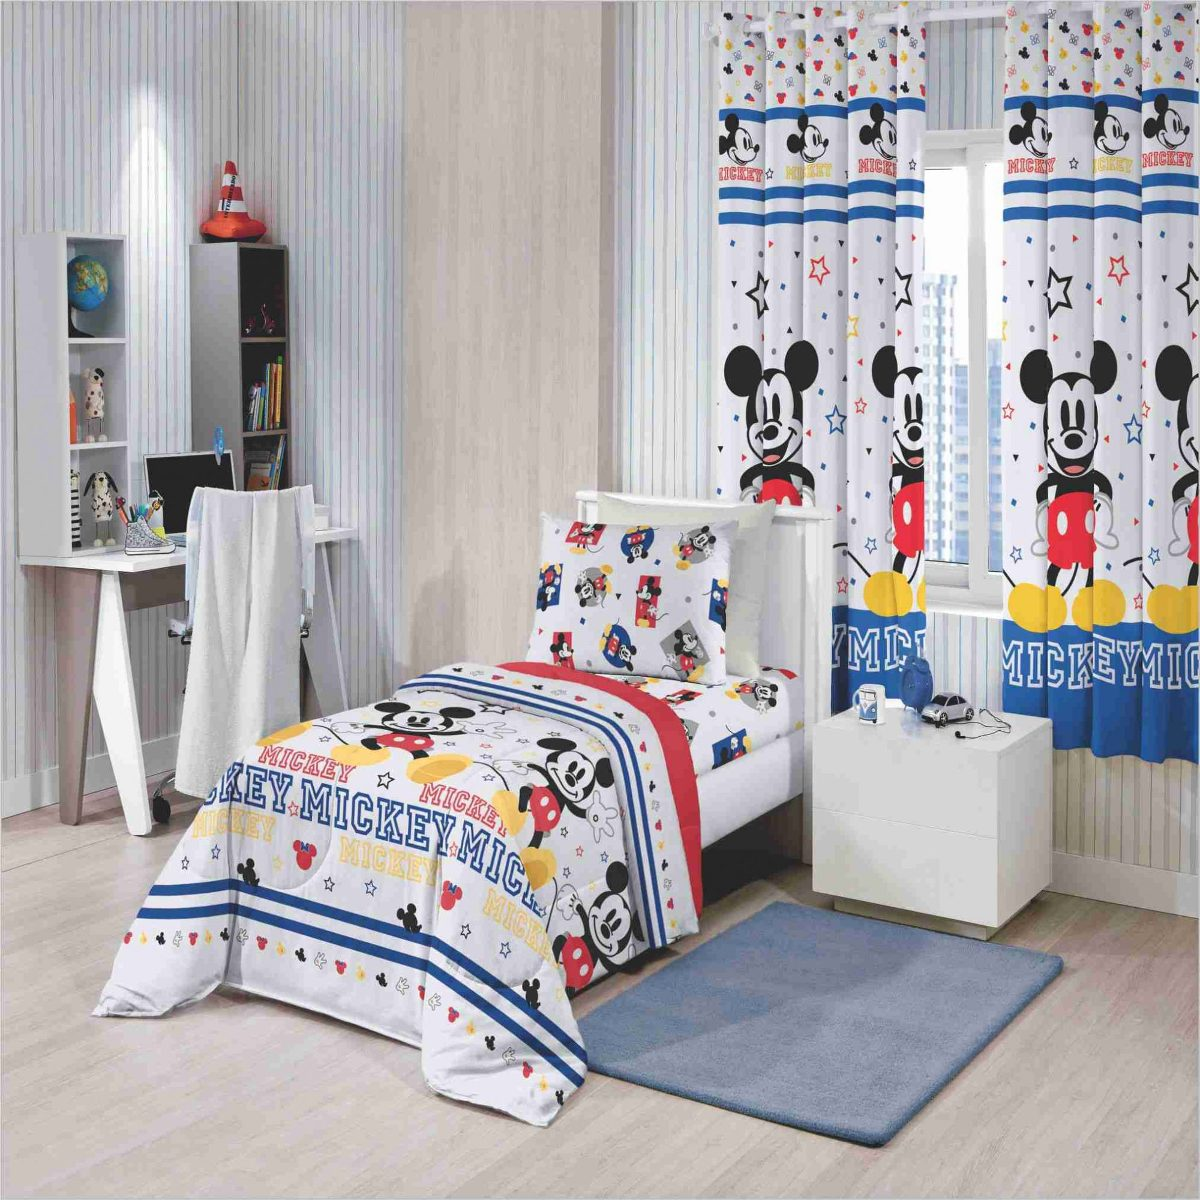 3b883848cb Kit 6 Pç Edredom+ Jogo Cama+ Cortina+toalha Infantil Mickey - R  314 ...